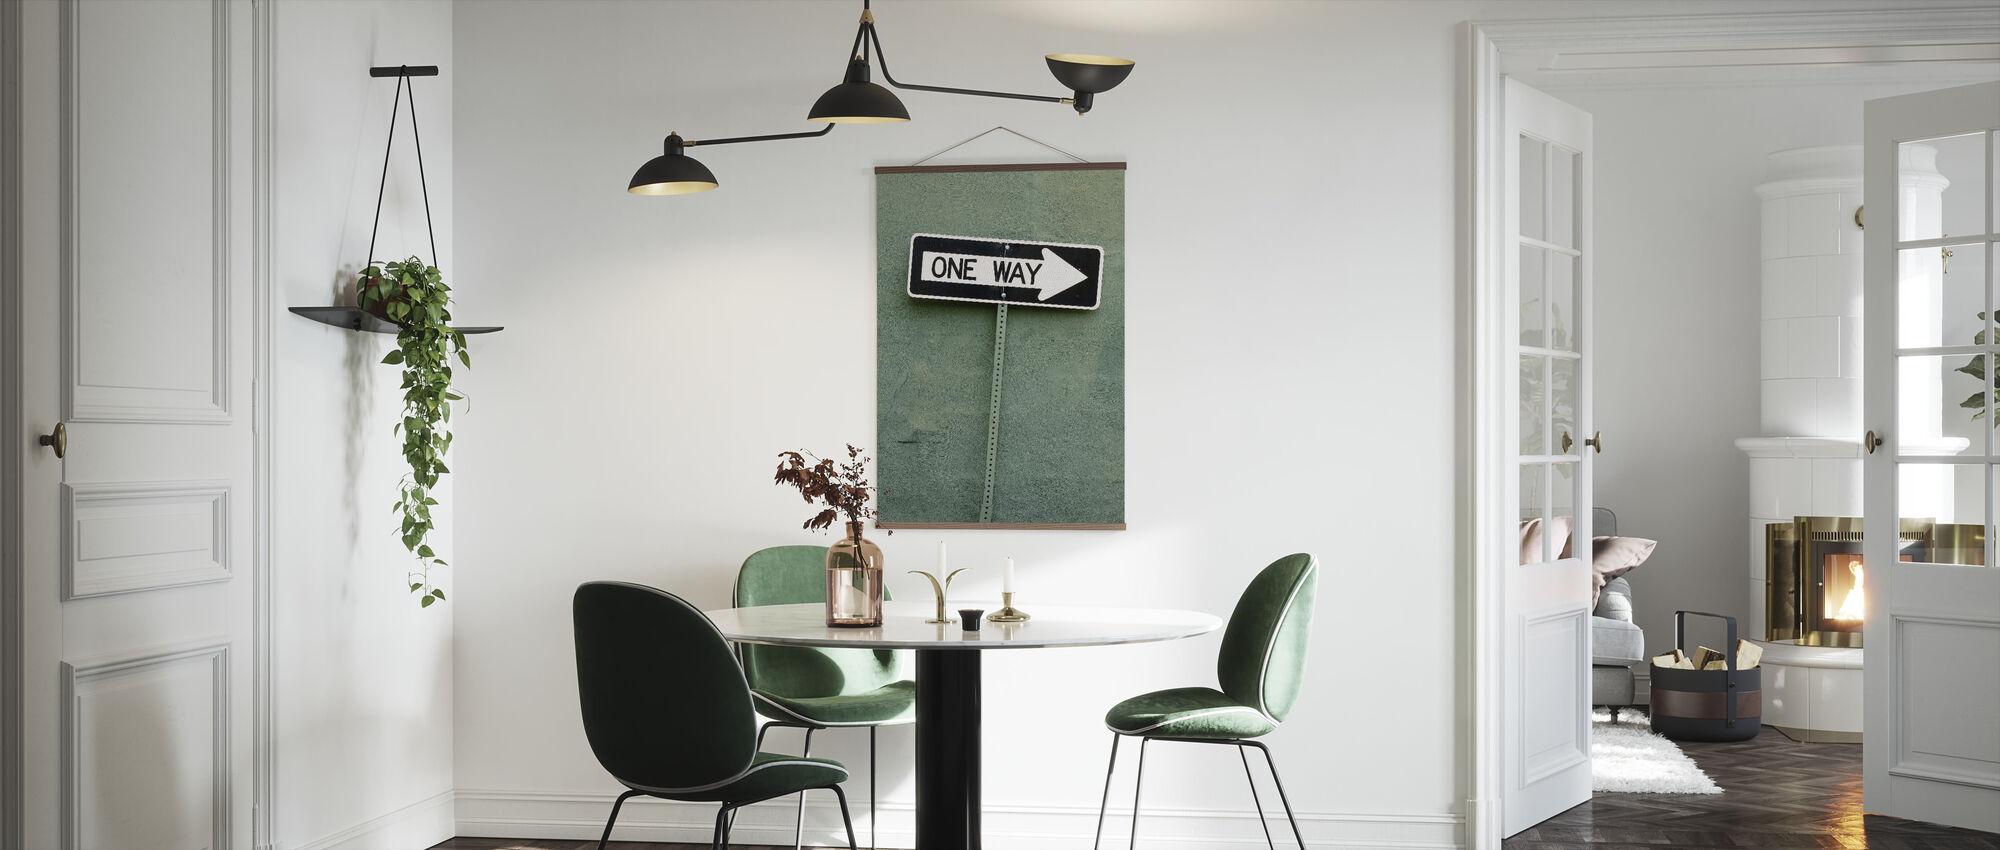 One Way - Poster - Kitchen